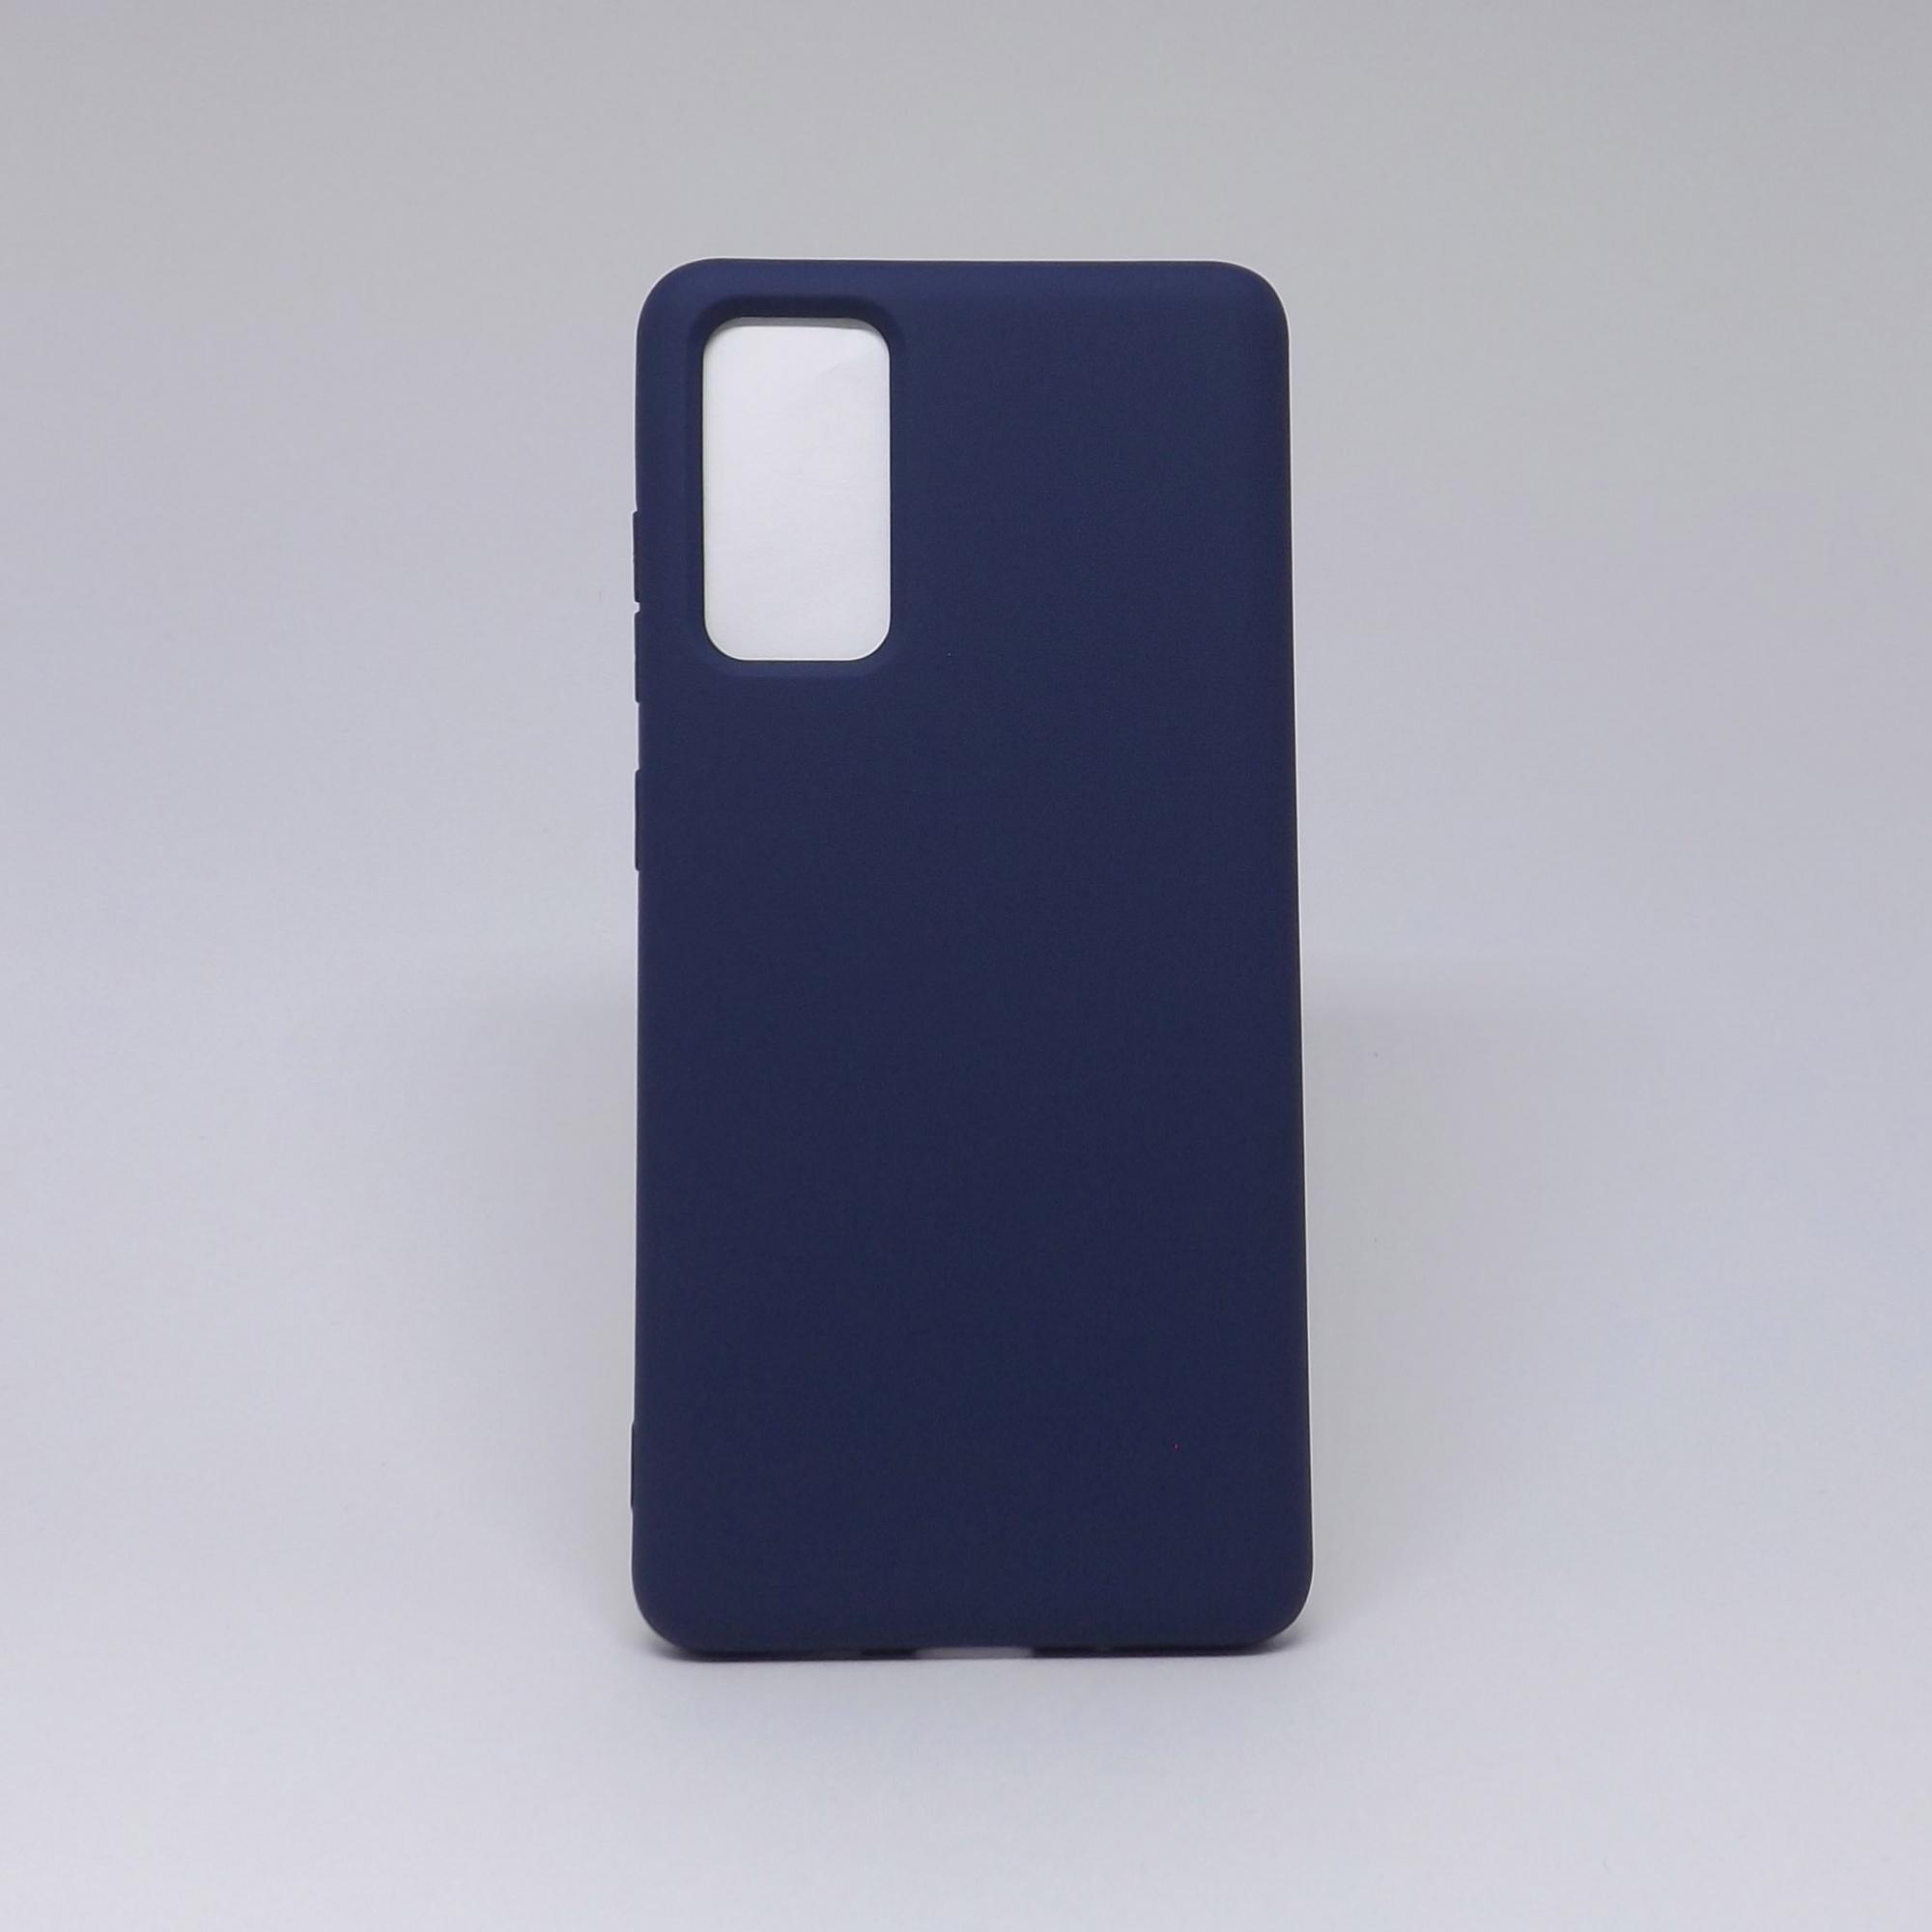 Capa Samsung Galaxy S20 FE Autêntica